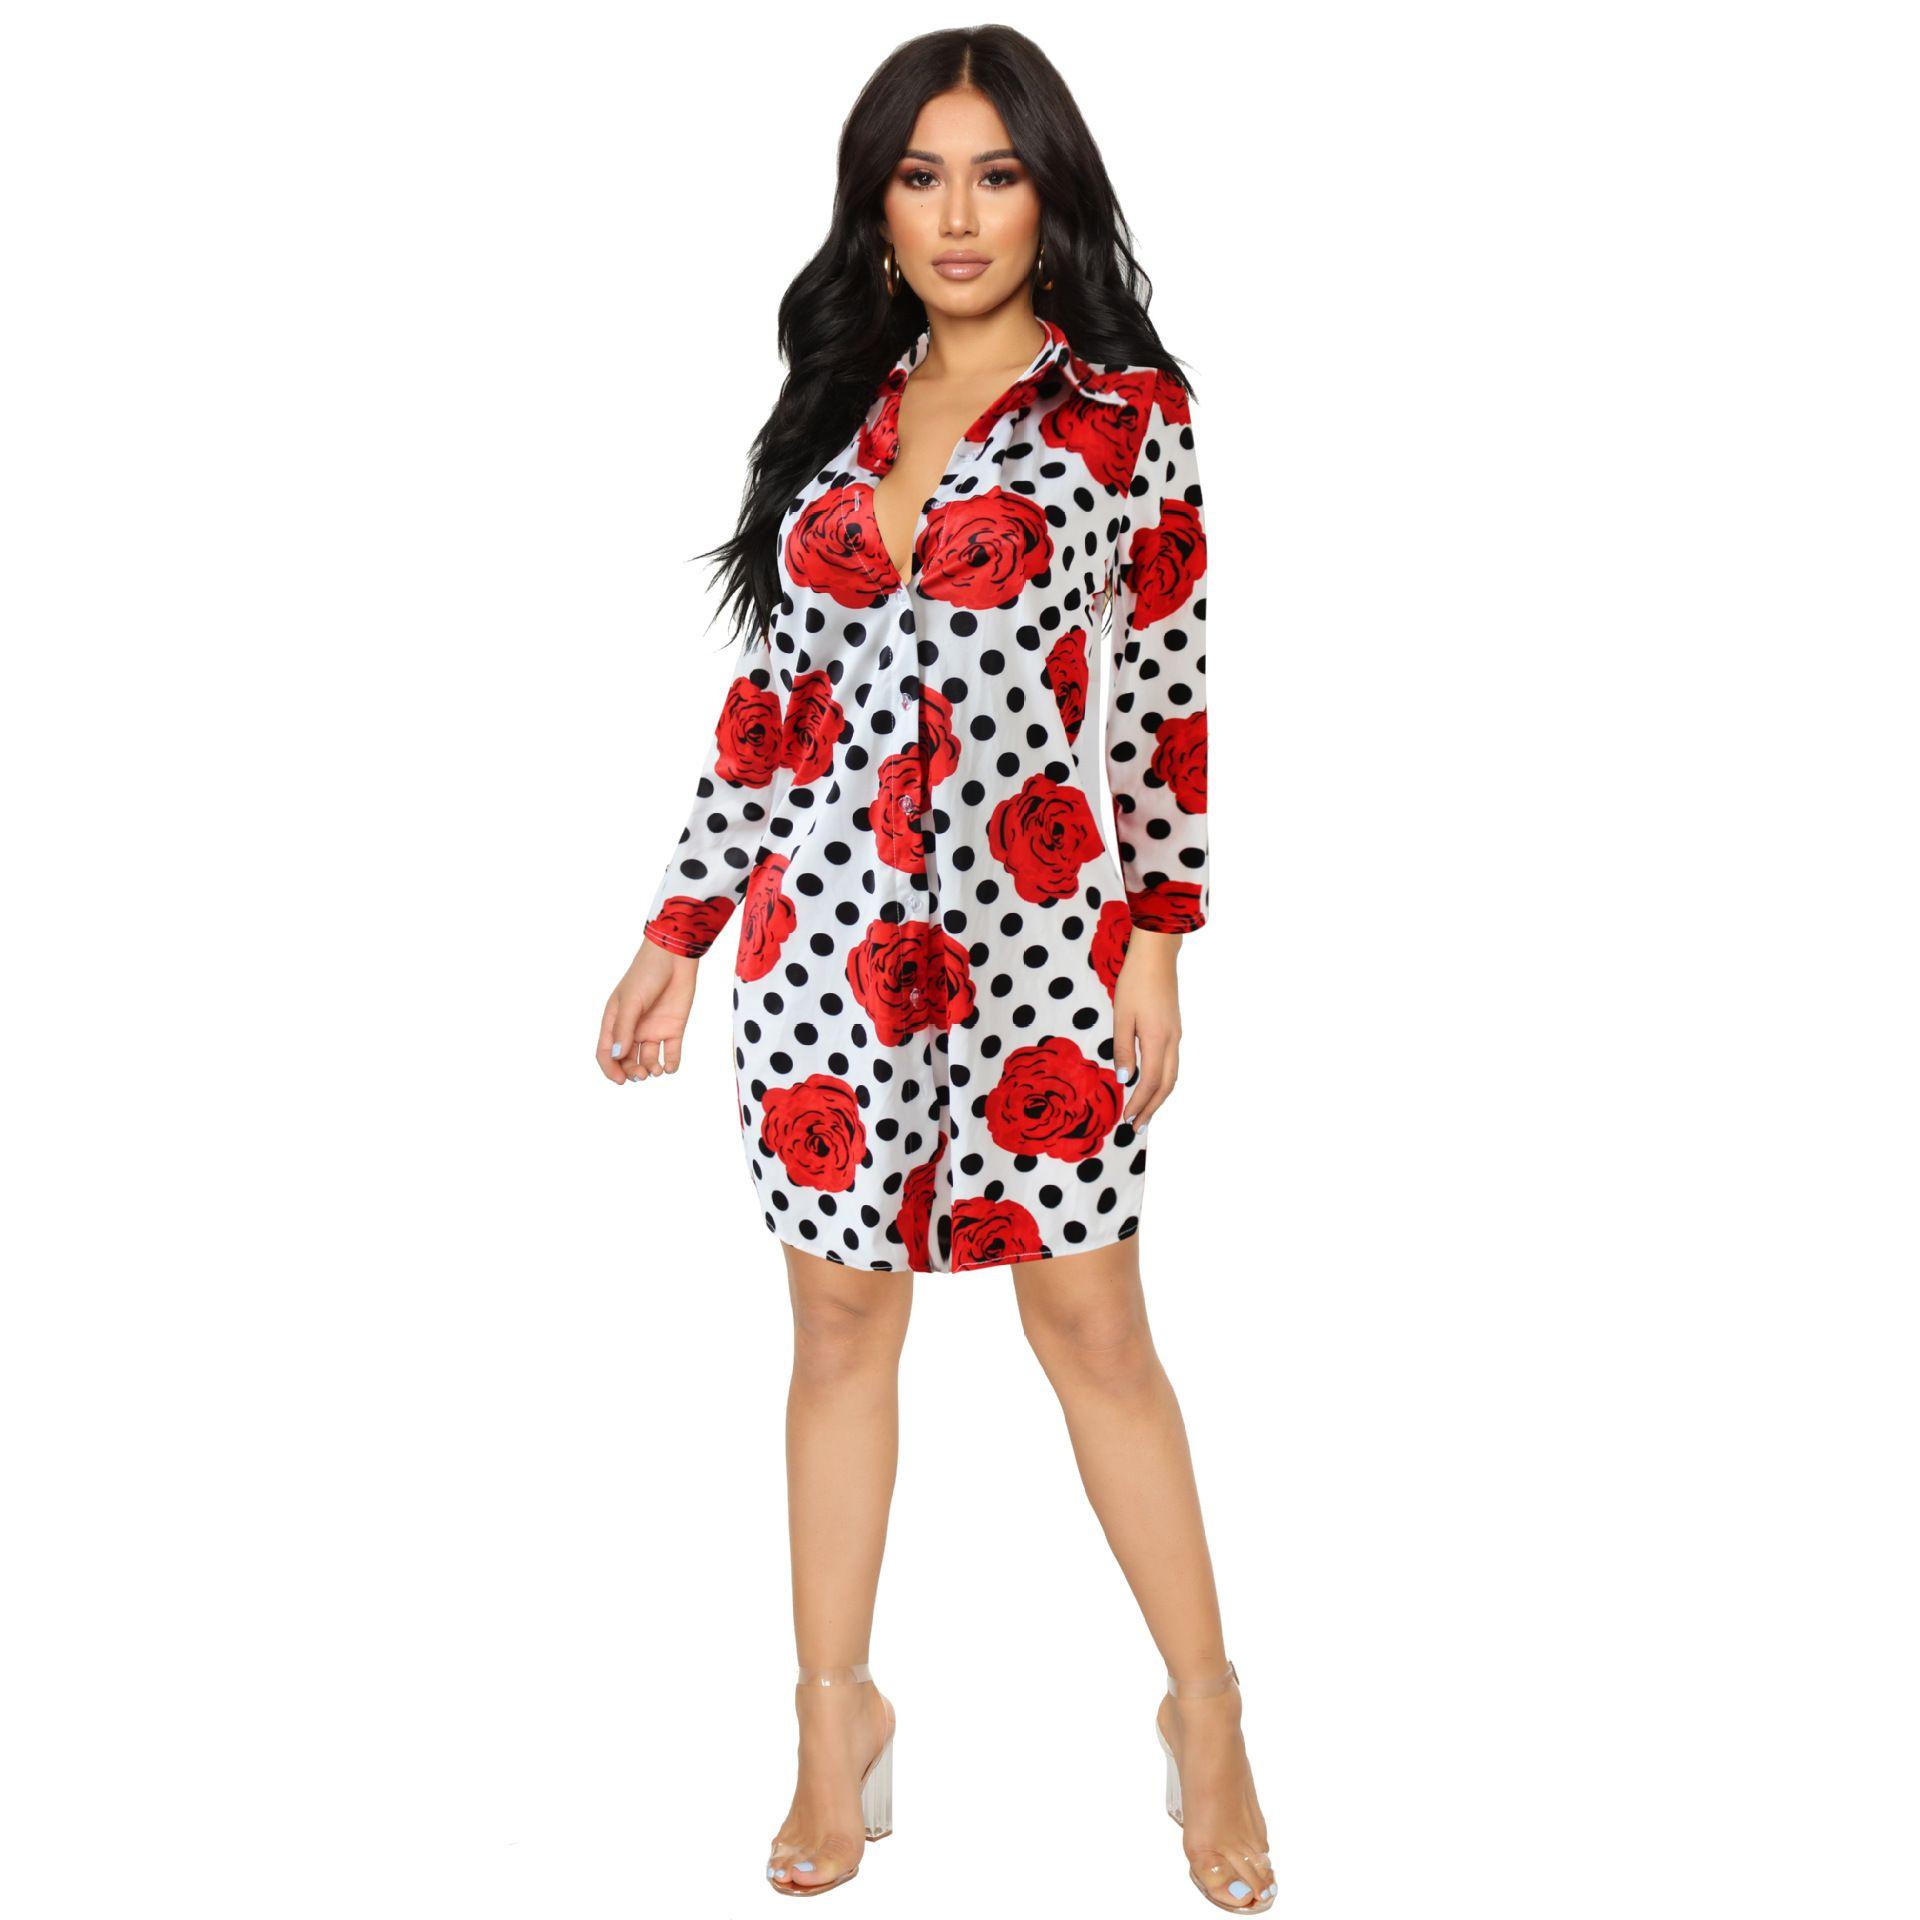 0307cd71c1f Floral Print Petite Dresses - Data Dynamic AG